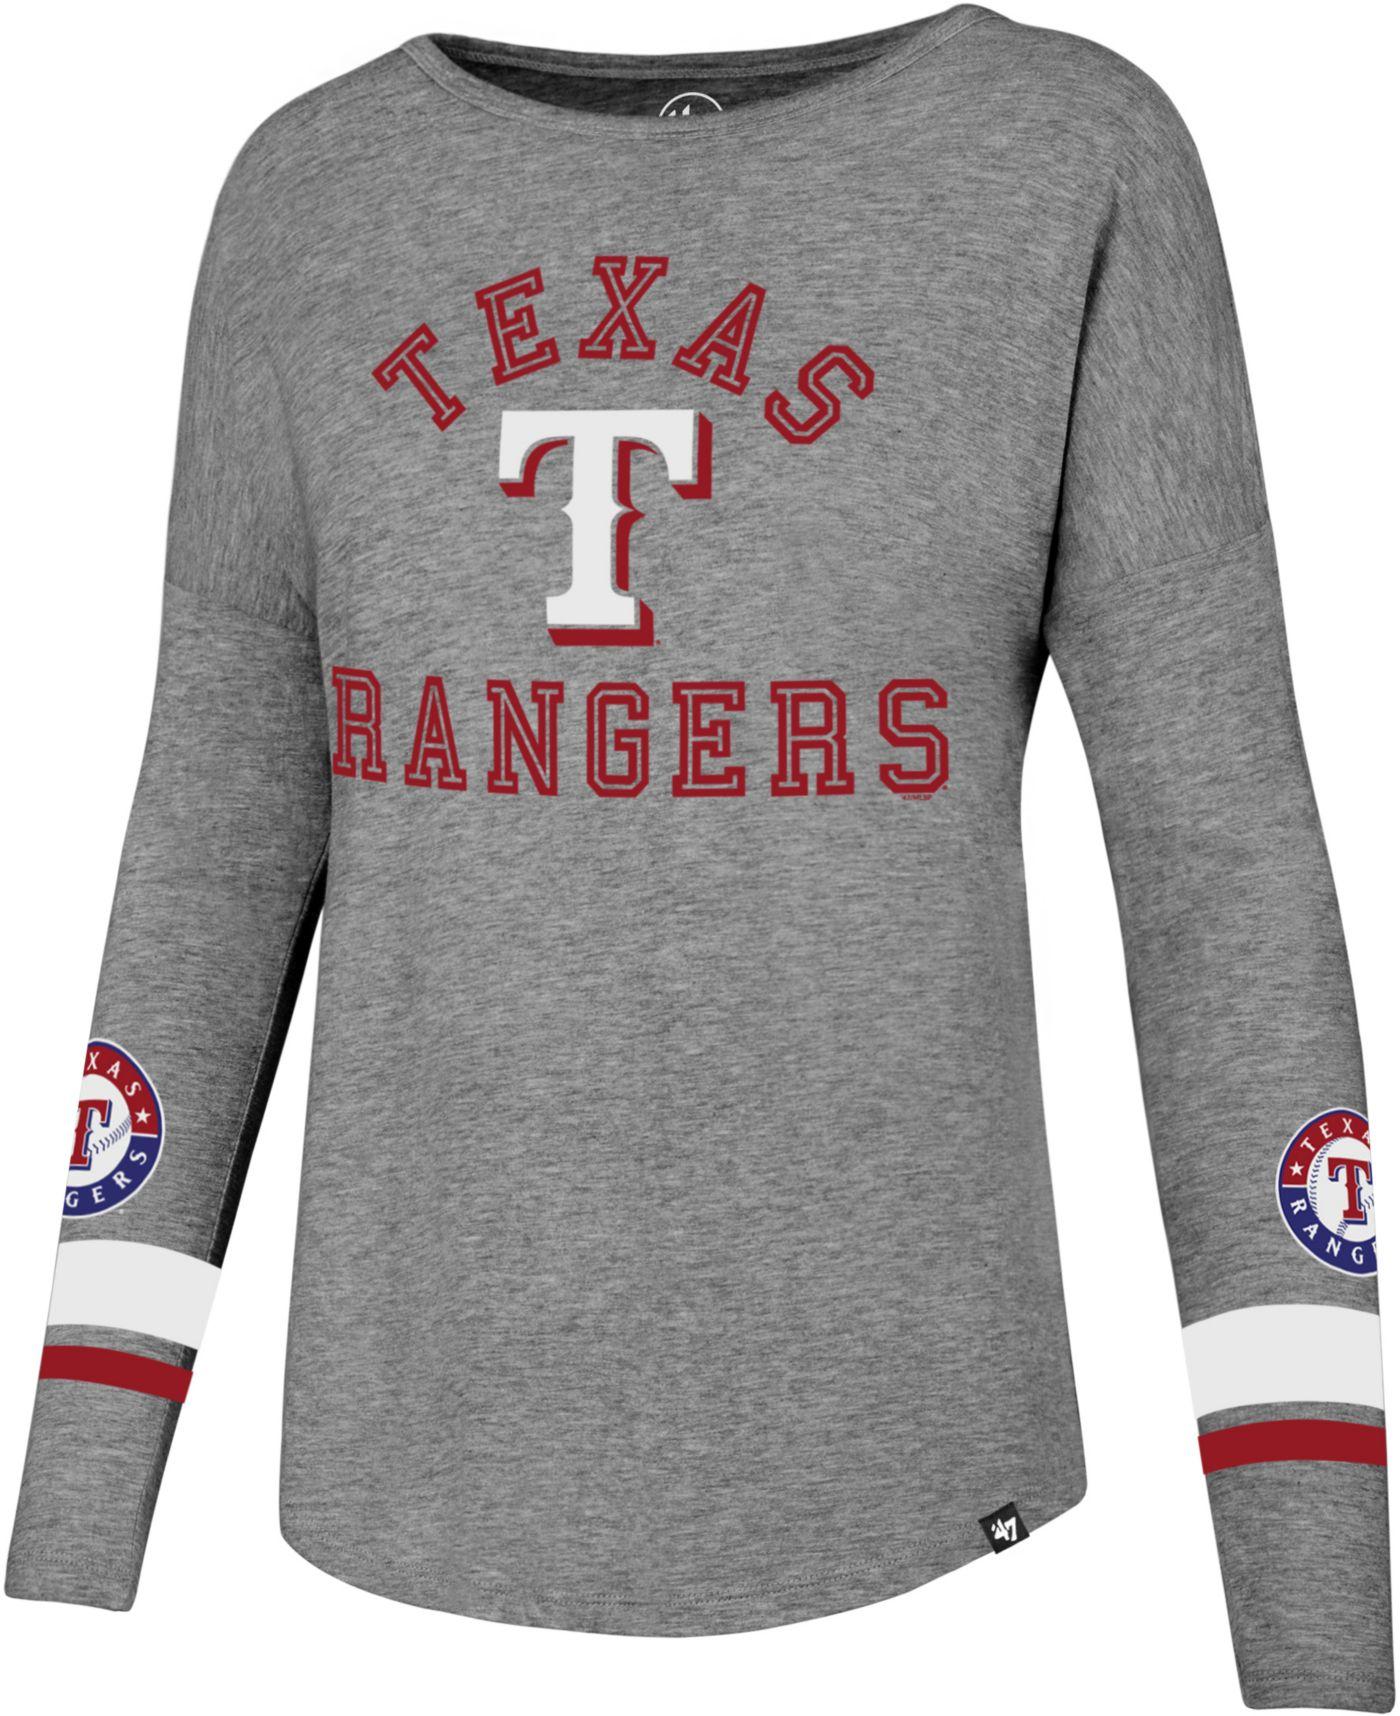 '47 Women's Texas Rangers Long Sleeve Crew